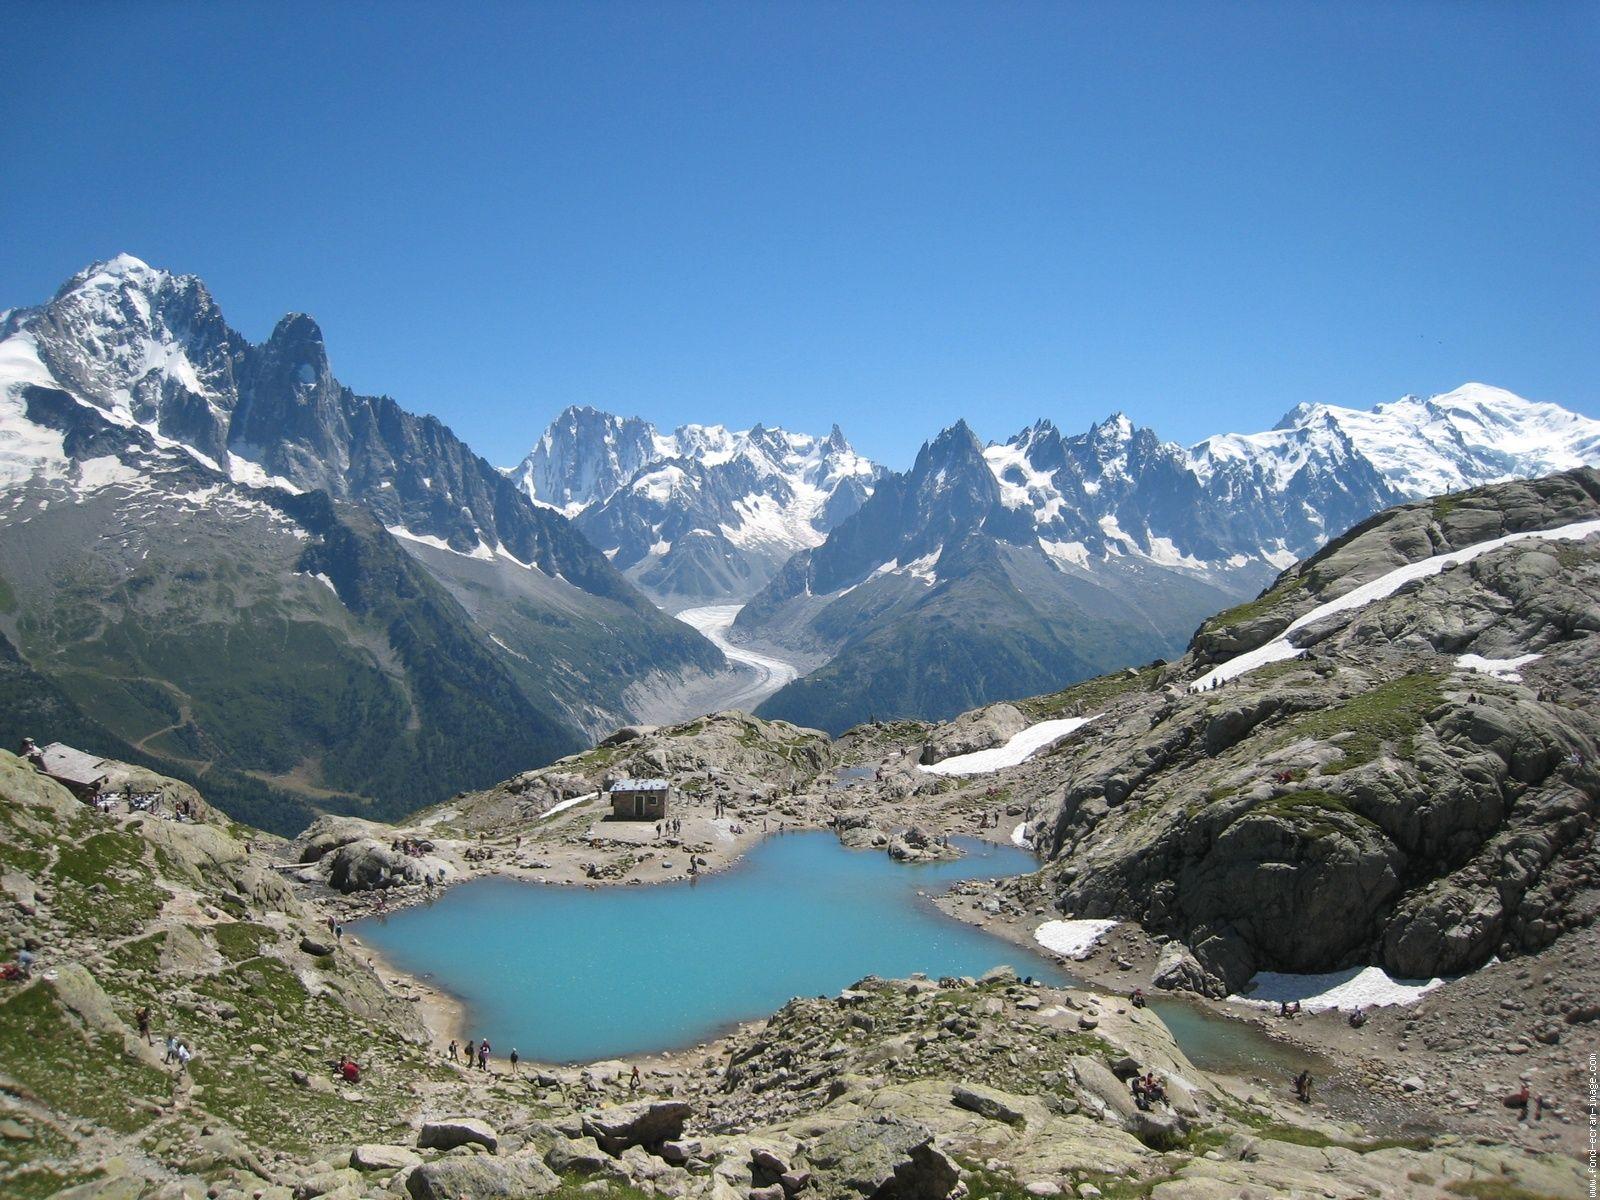 Lac blanc haute savoie rh ne alpes france ranska for Haute savoie